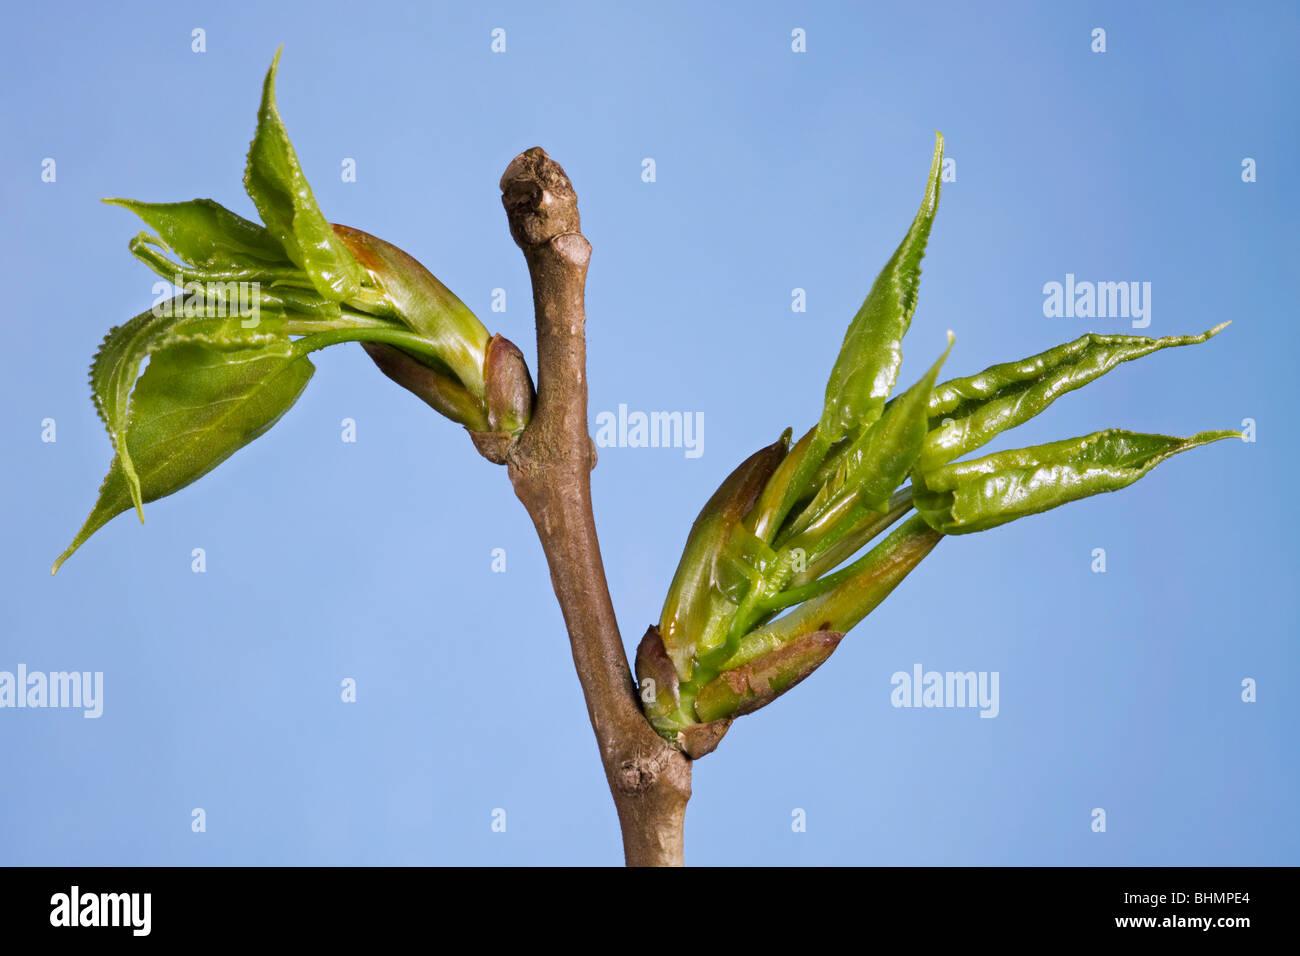 Carolina Poplar (Populus canadensis) showing buds and leaves emerging, Belgium - Stock Image